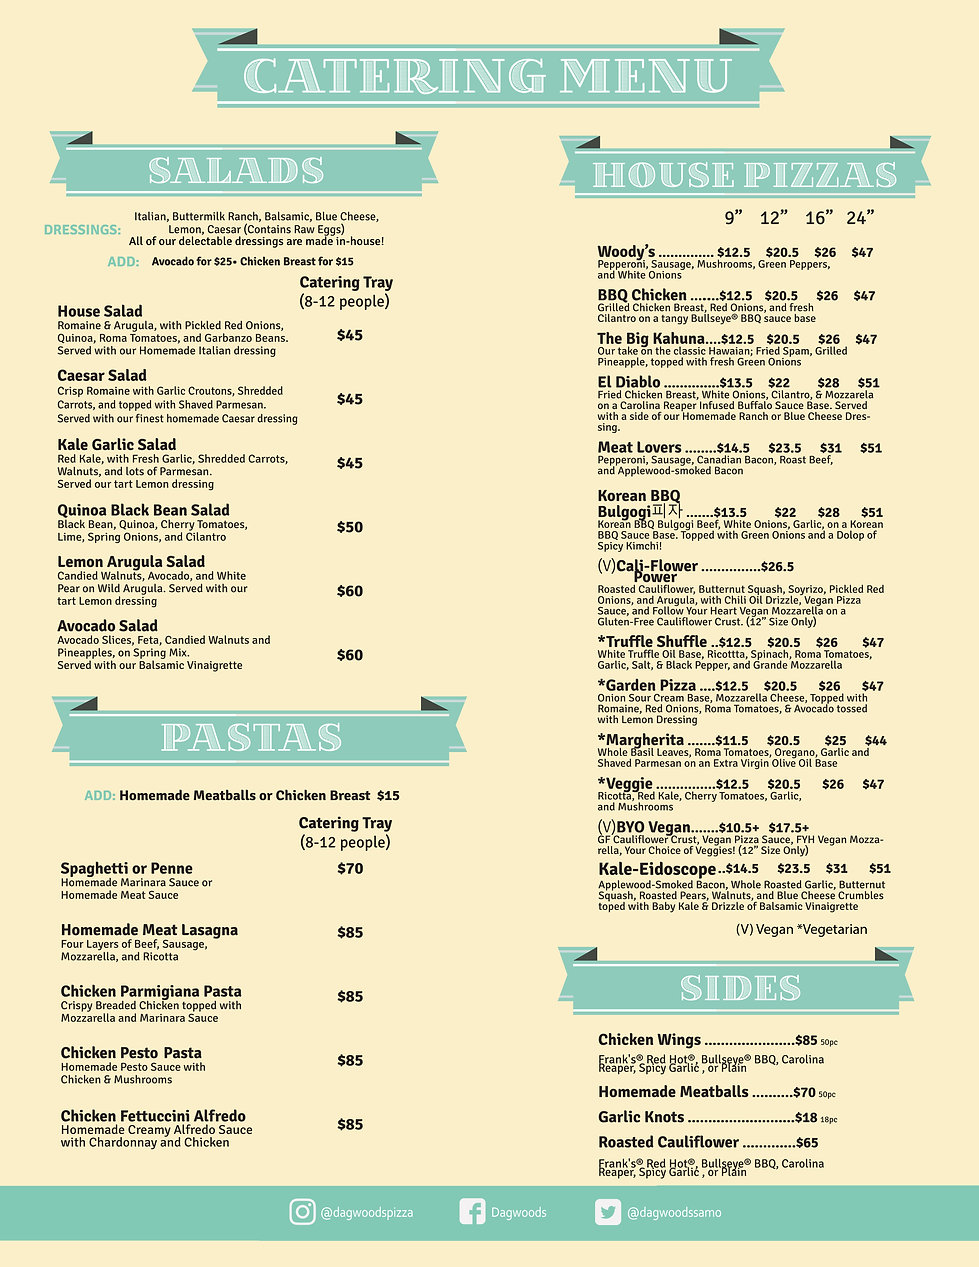 catering menu 2020-06-30.jpg